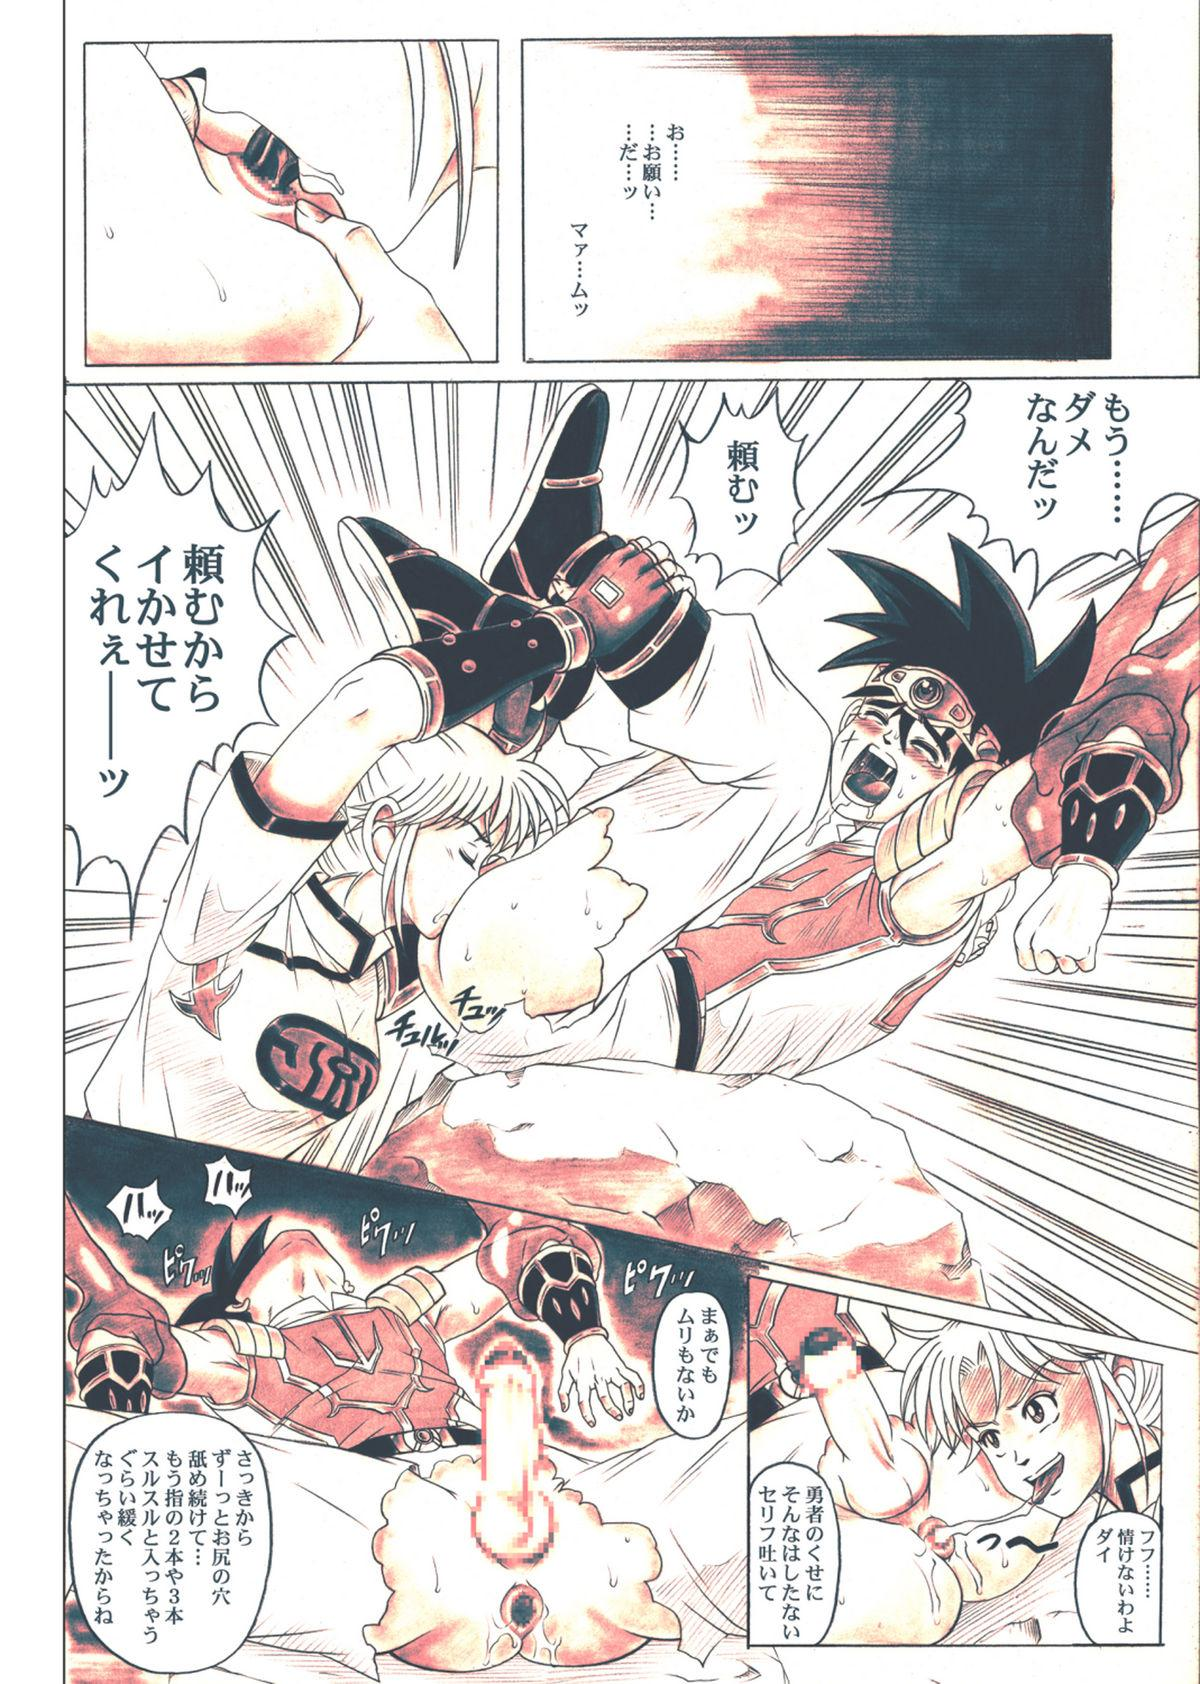 [Cyclone (Reizei, Izumi)] STAR TAC IDO ~Youkuso Haja no Doukutsu he~ Chuuhen Download edition (Dragon Warrior: Dai's Great Adventure) [Digital] 133